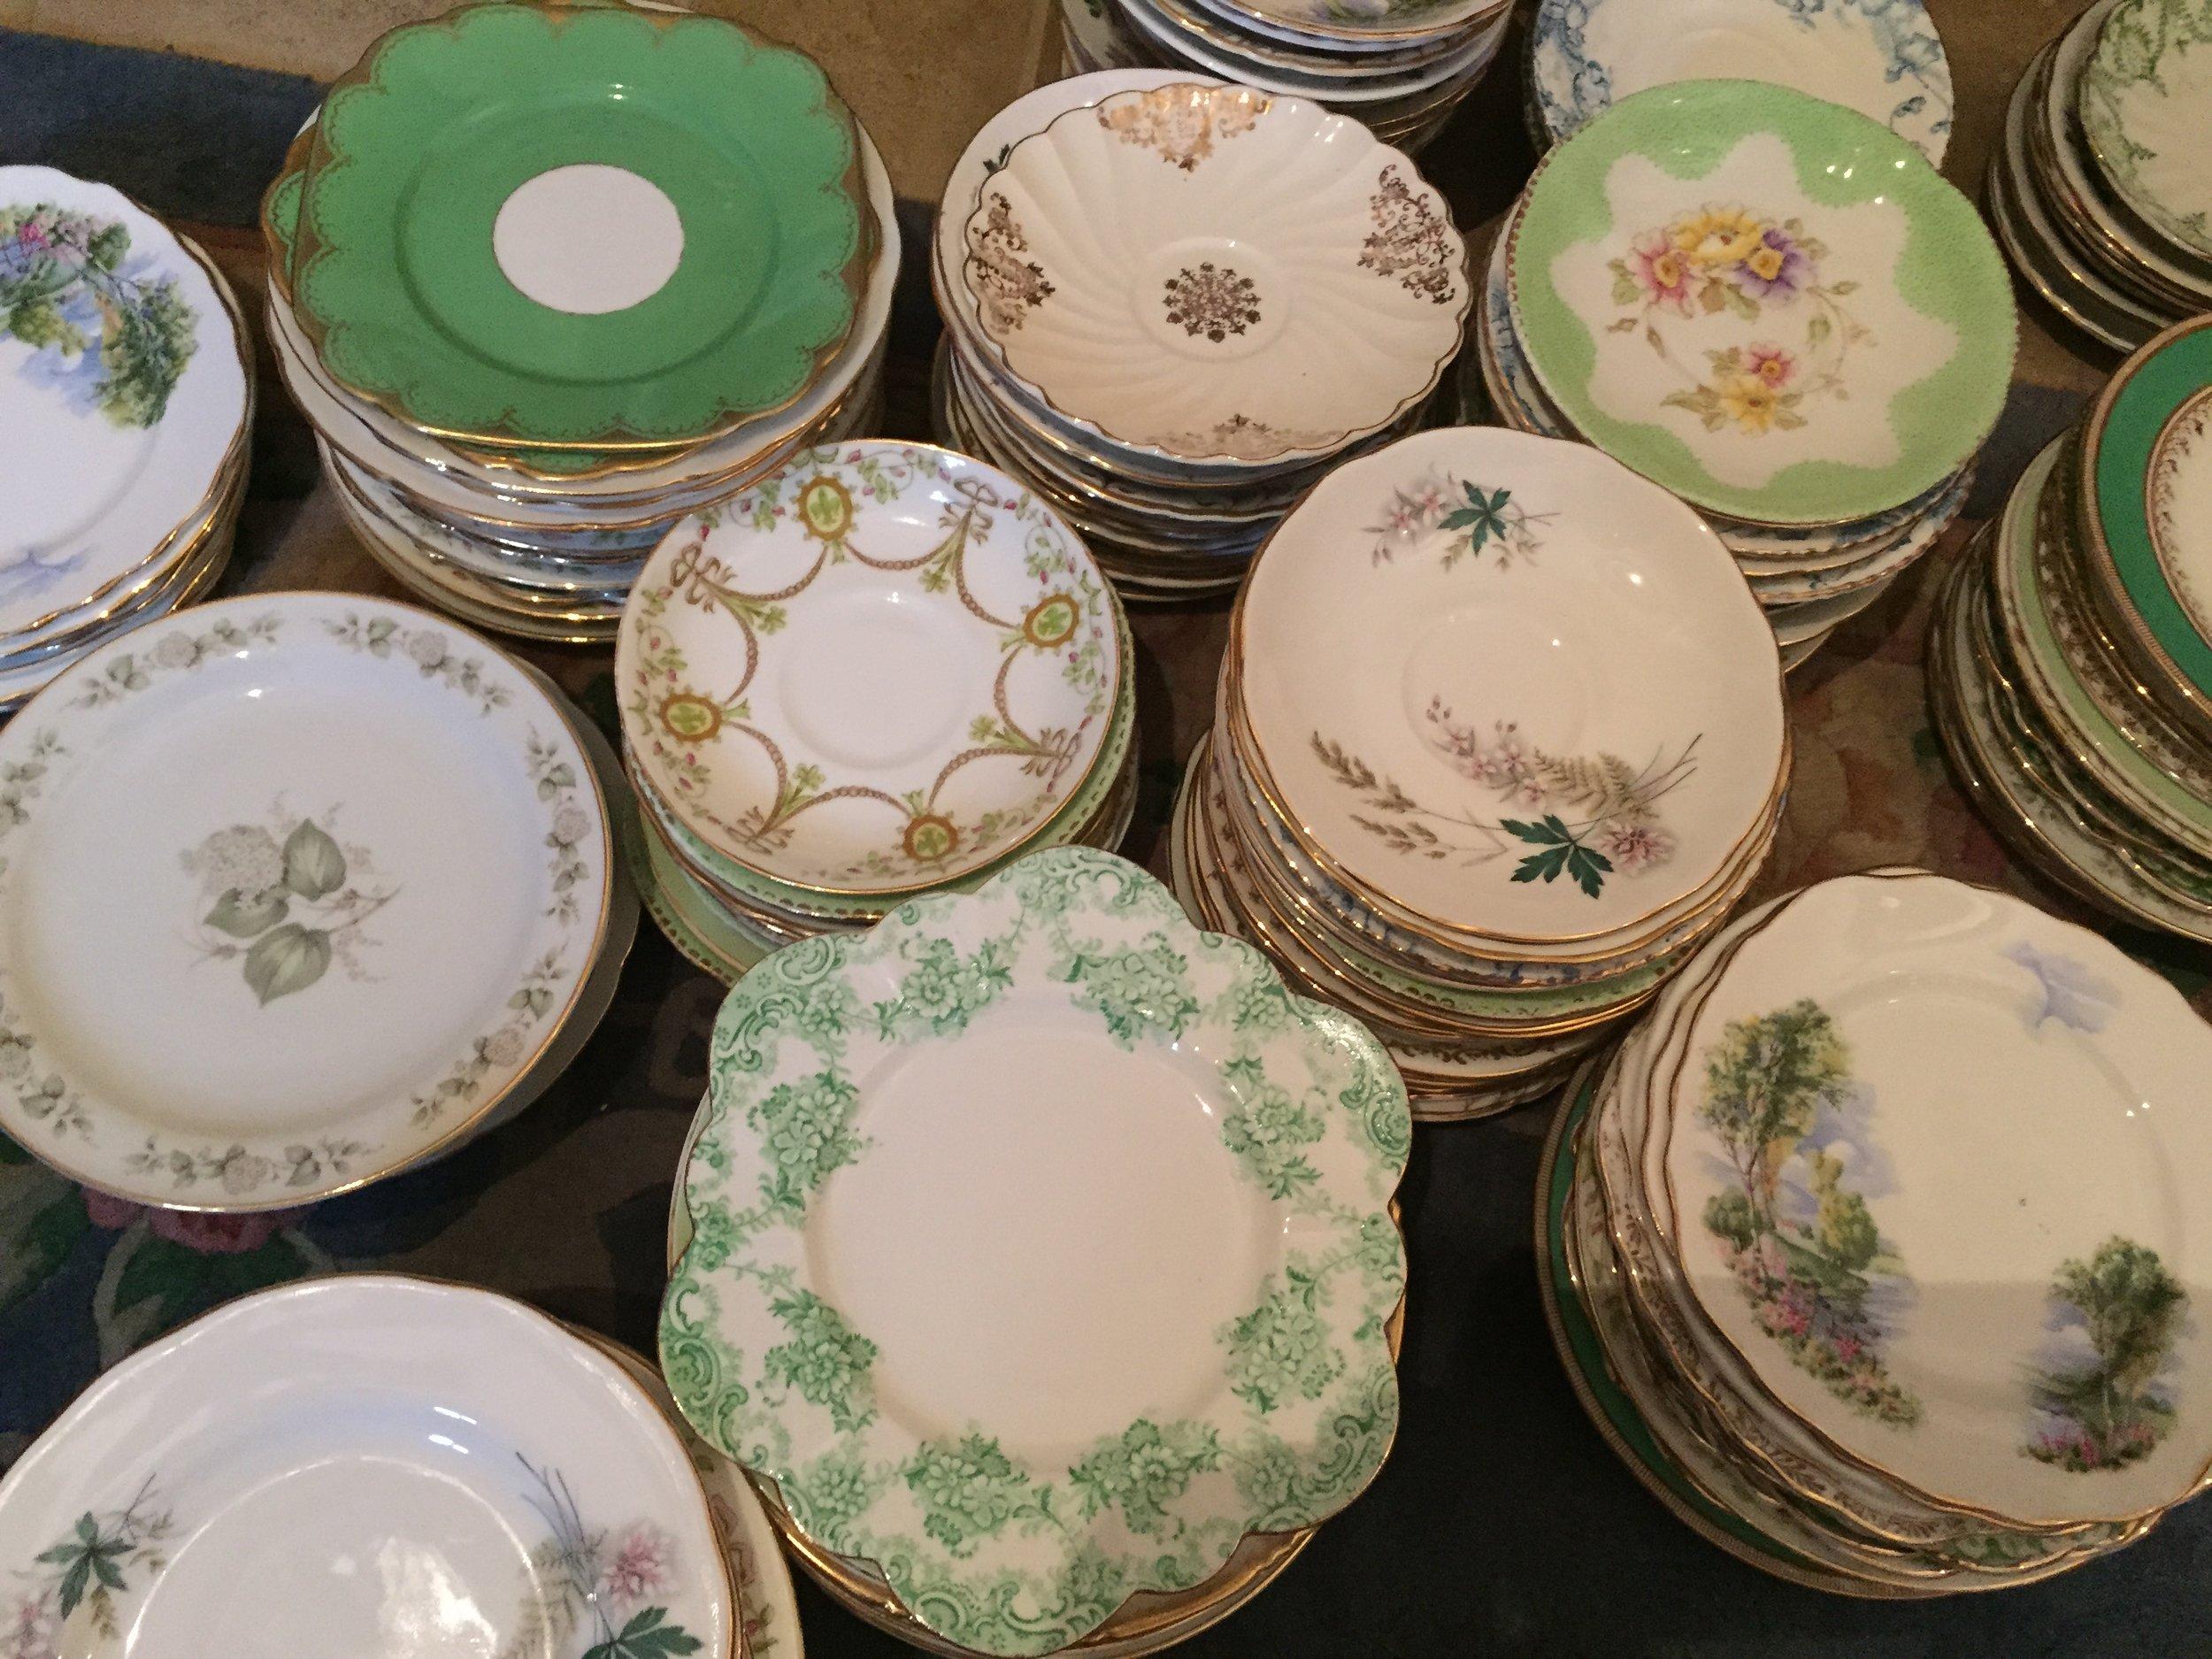 cake plates in greens.JPG